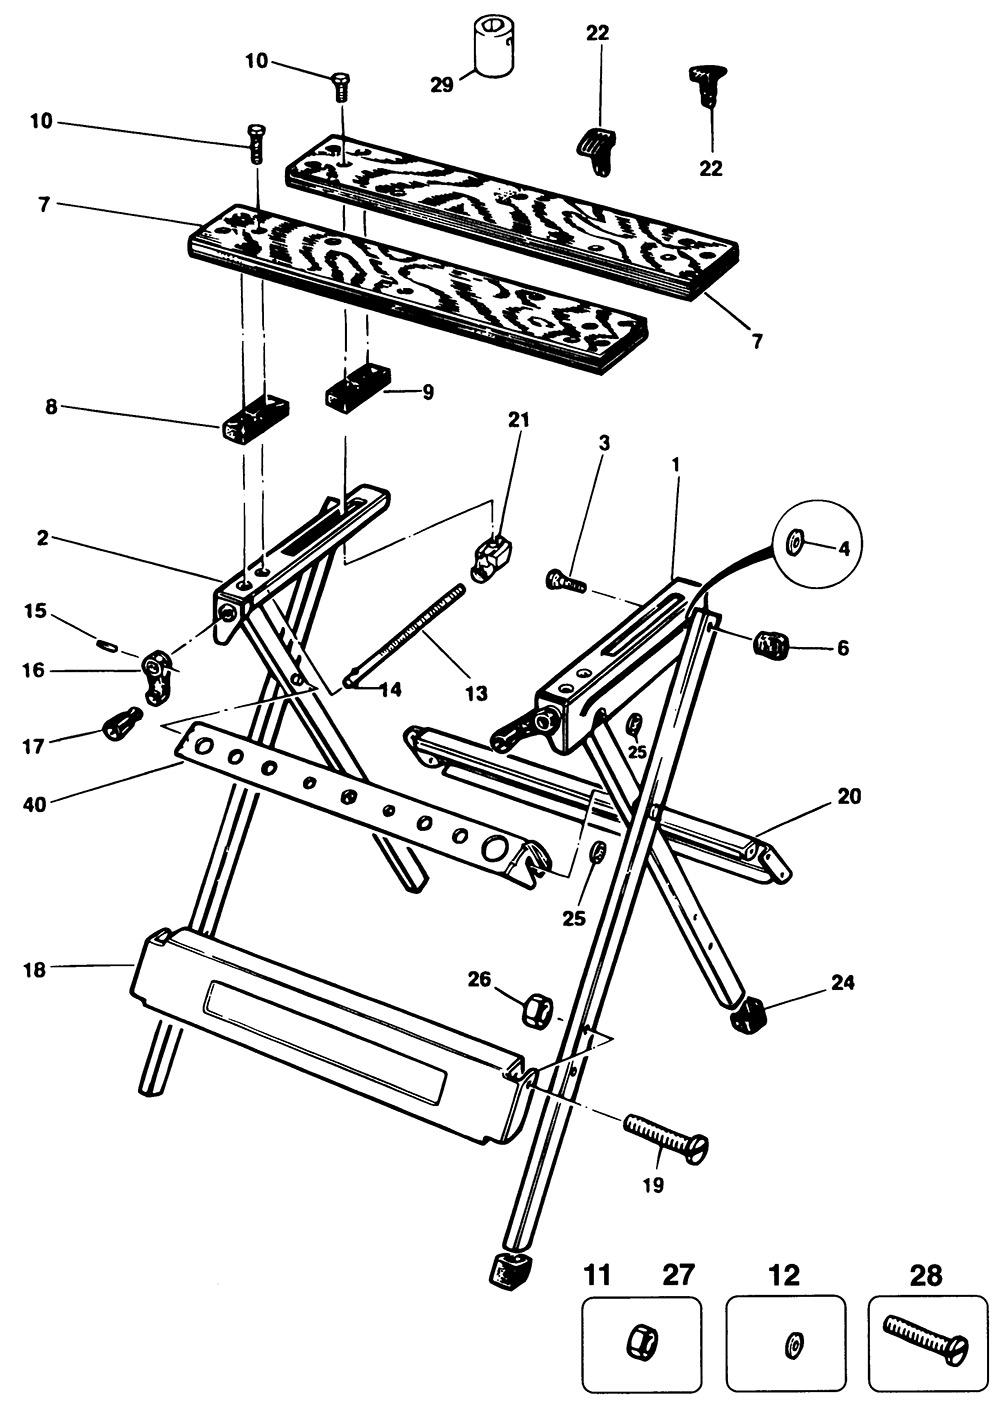 Black Amp Decker Wm300 Type 1 Workmate Spare Parts Part